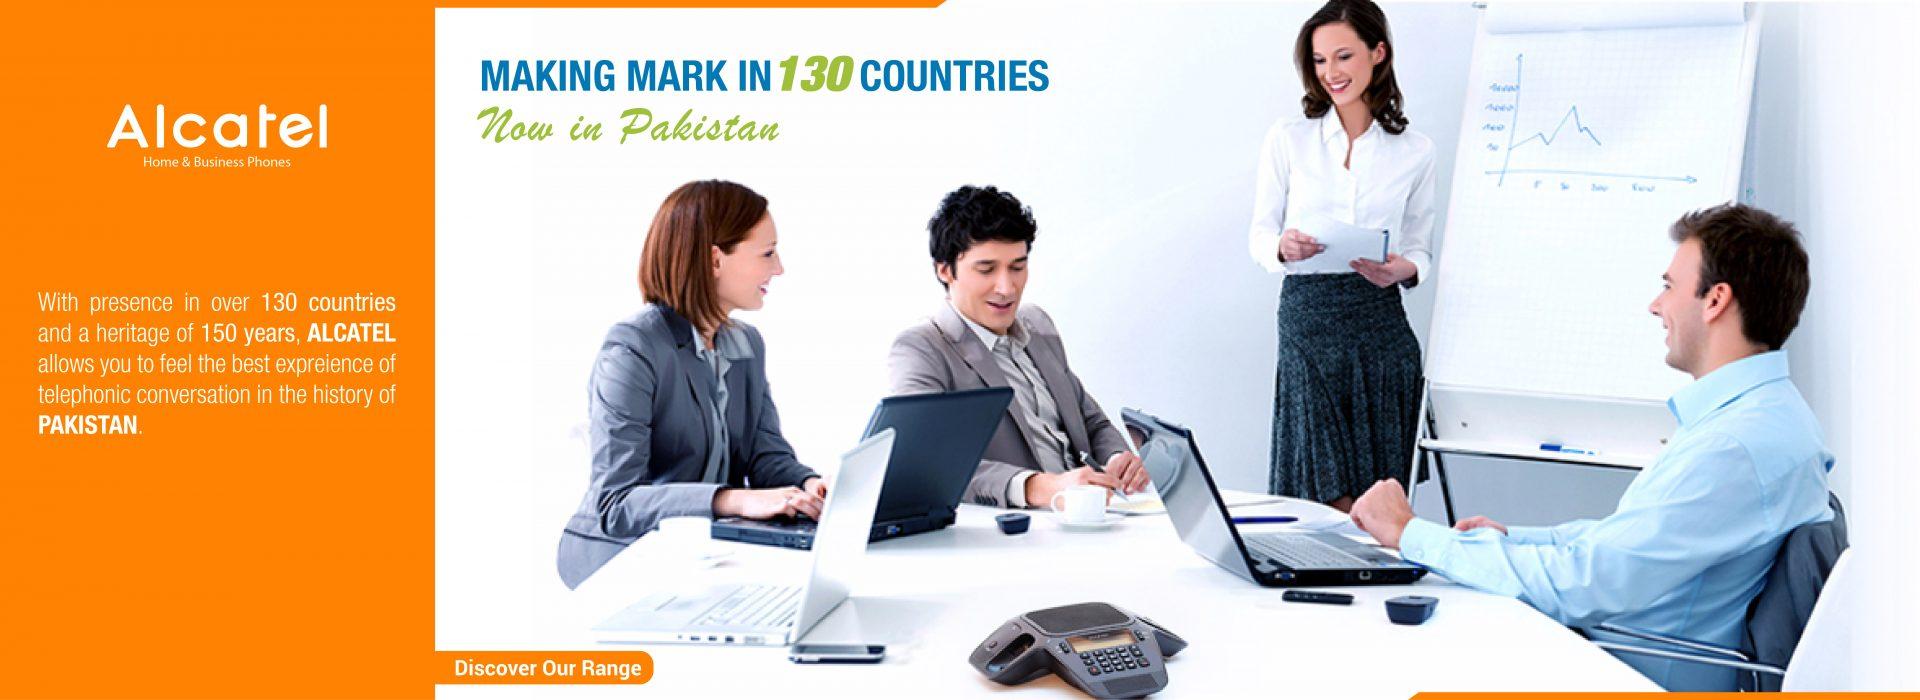 ALCATEL-Distributor-Home-Business-Phones-Pakistan-2-12